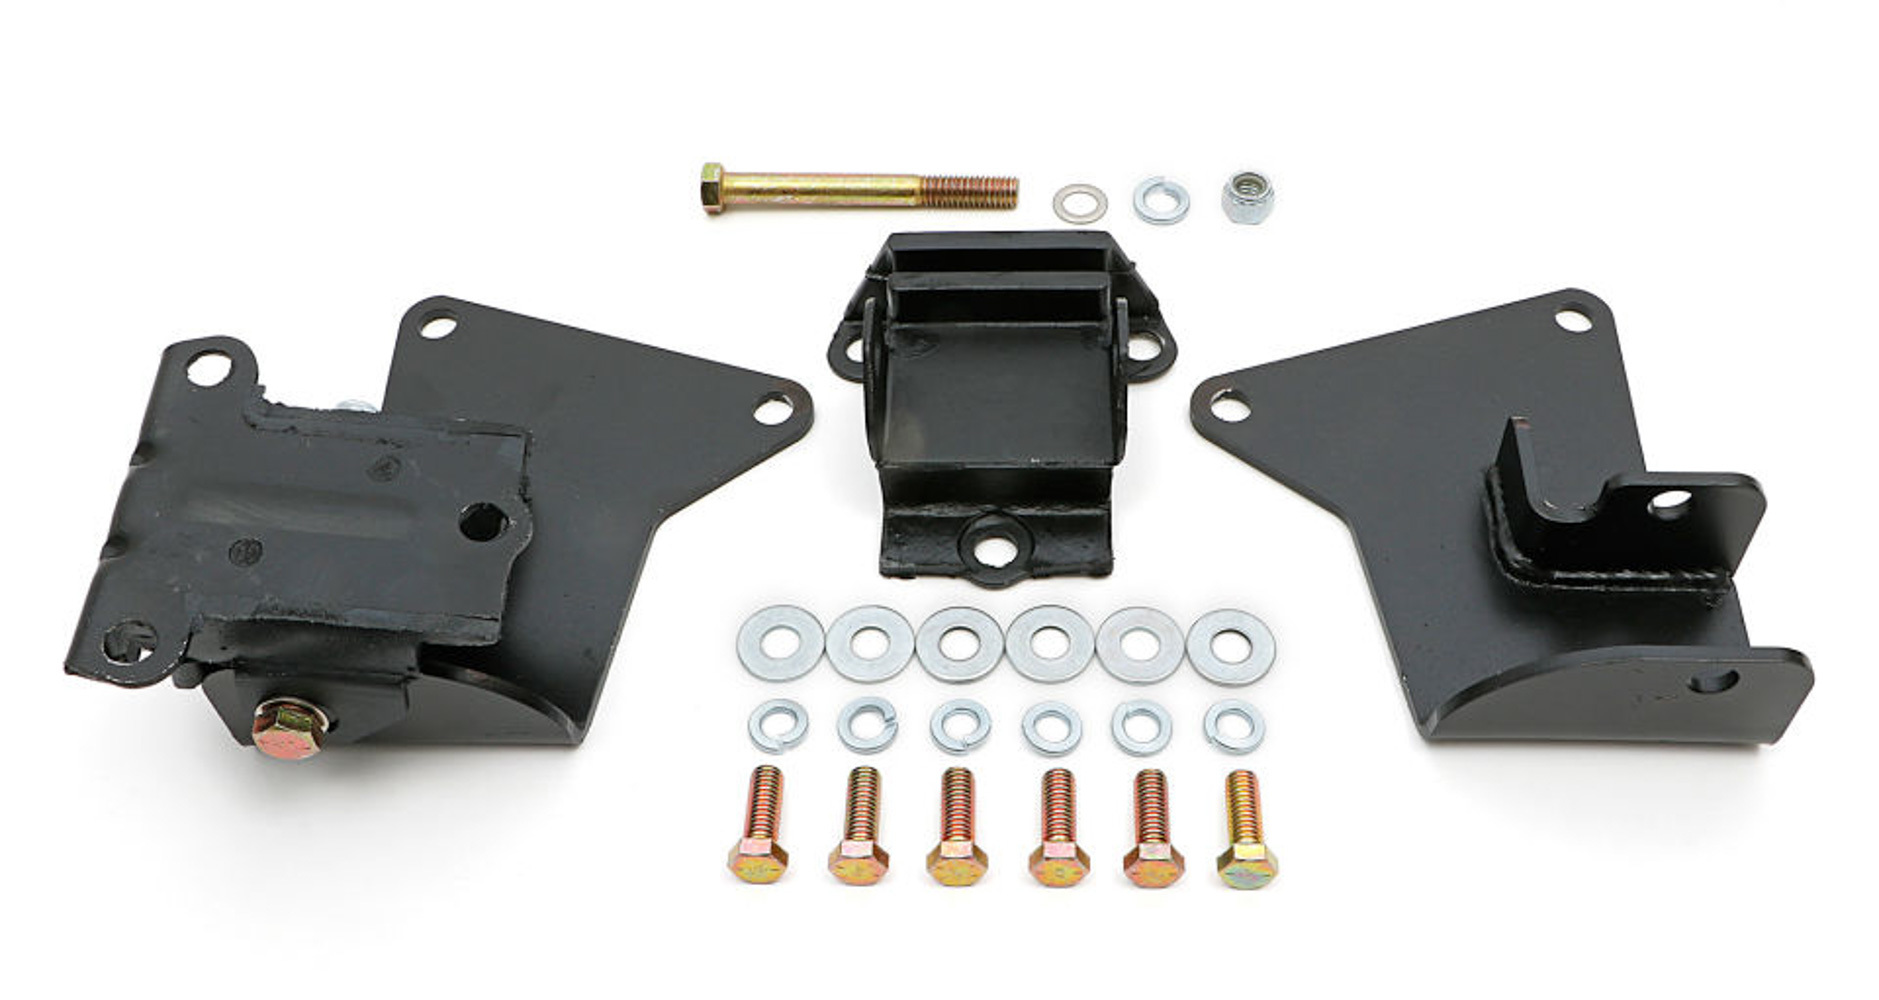 Trans Dapt 9556 Motor Mount Adapter, Bolt-On, Steel, Black Paint, Chevy V8, GM A-Body 1964-72, Kit